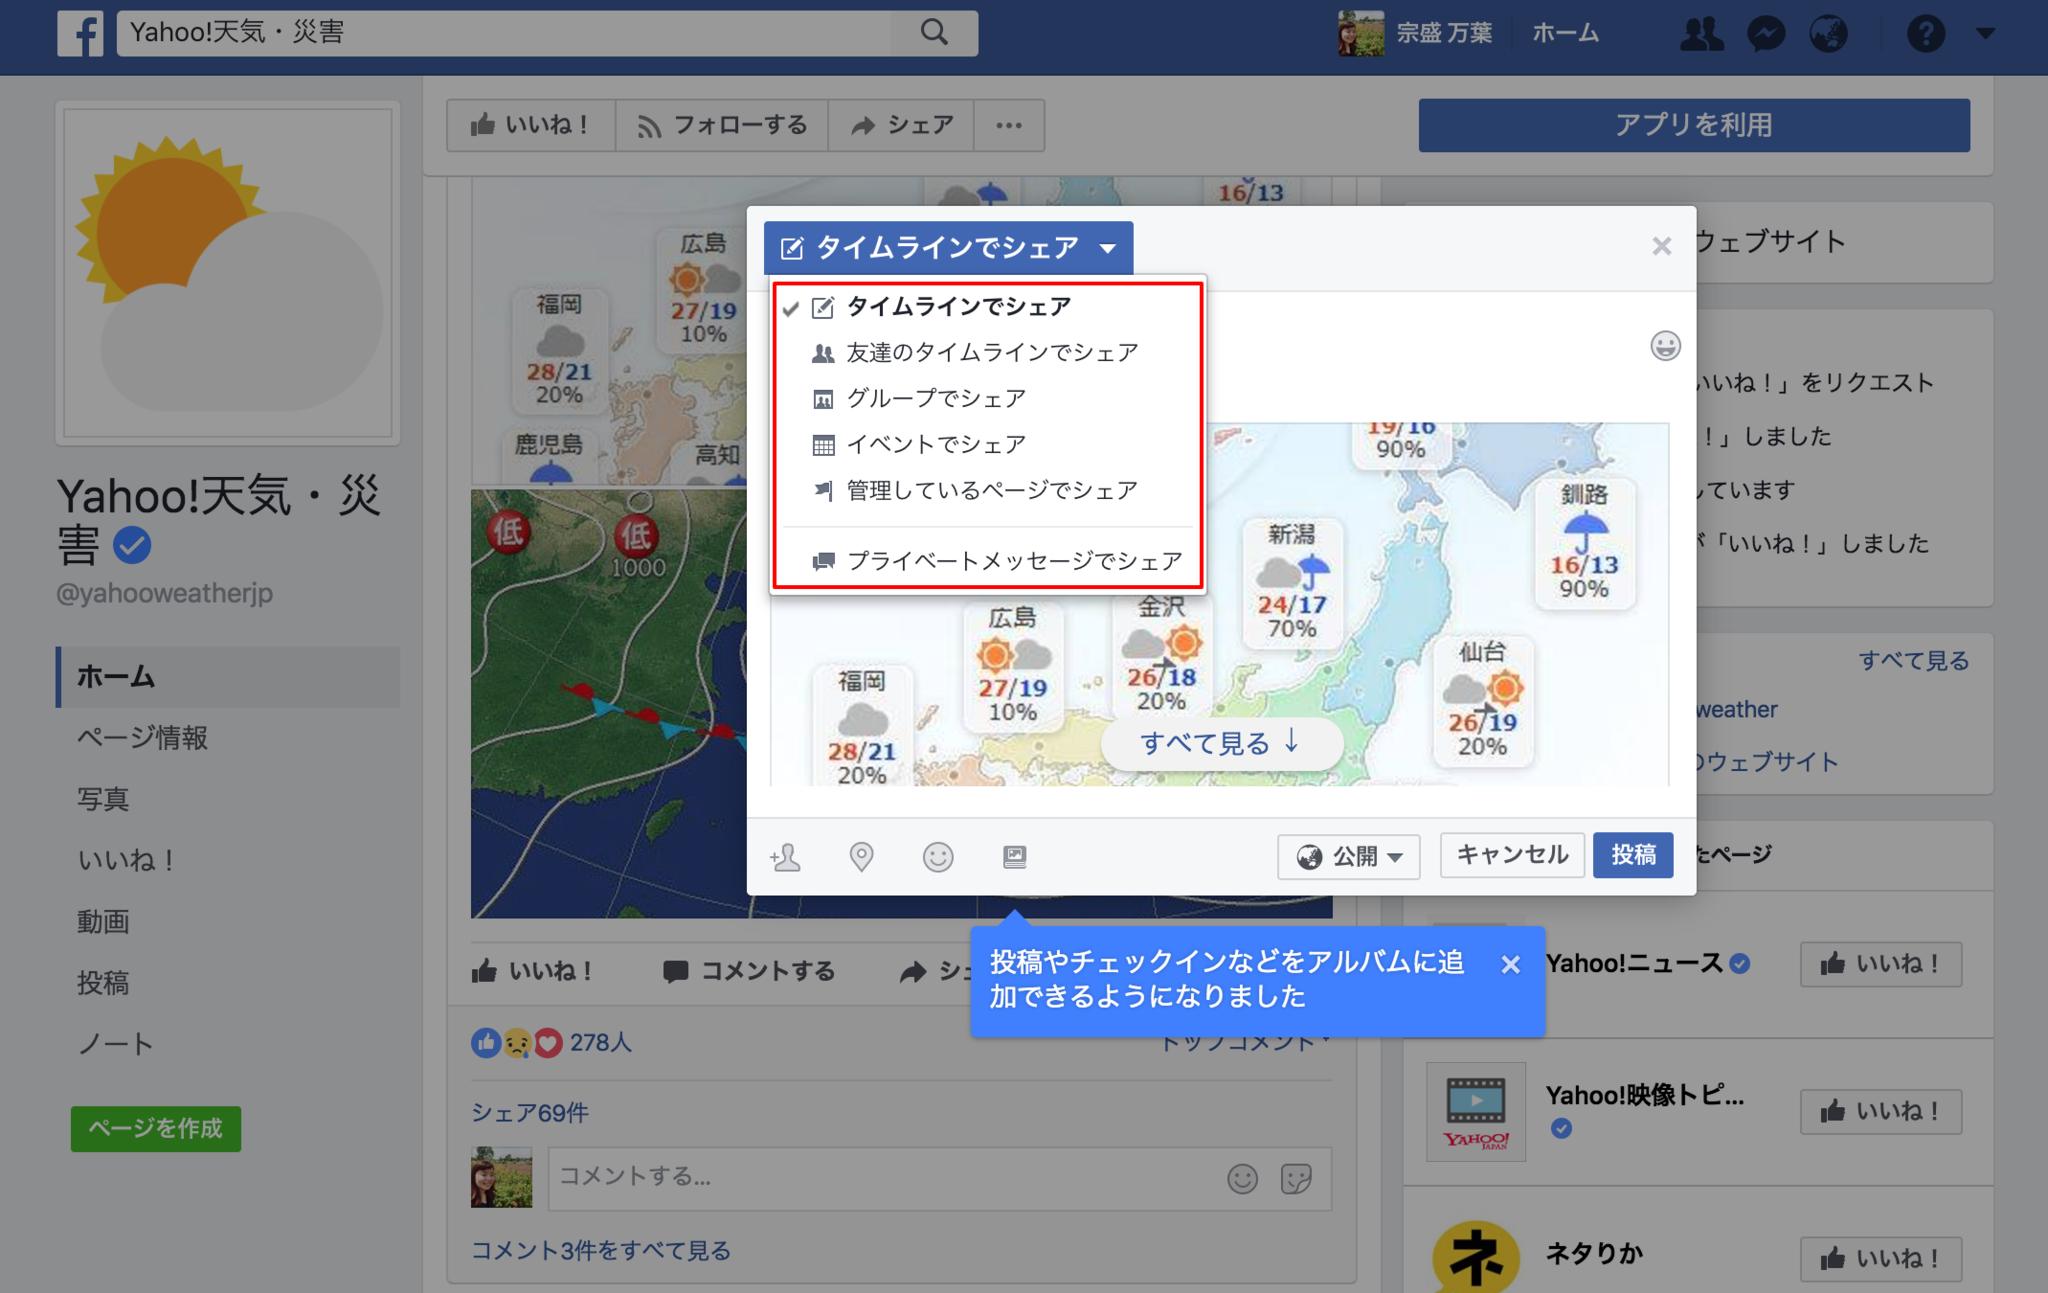 Yahoo_天気・災害___ホーム_(2).png